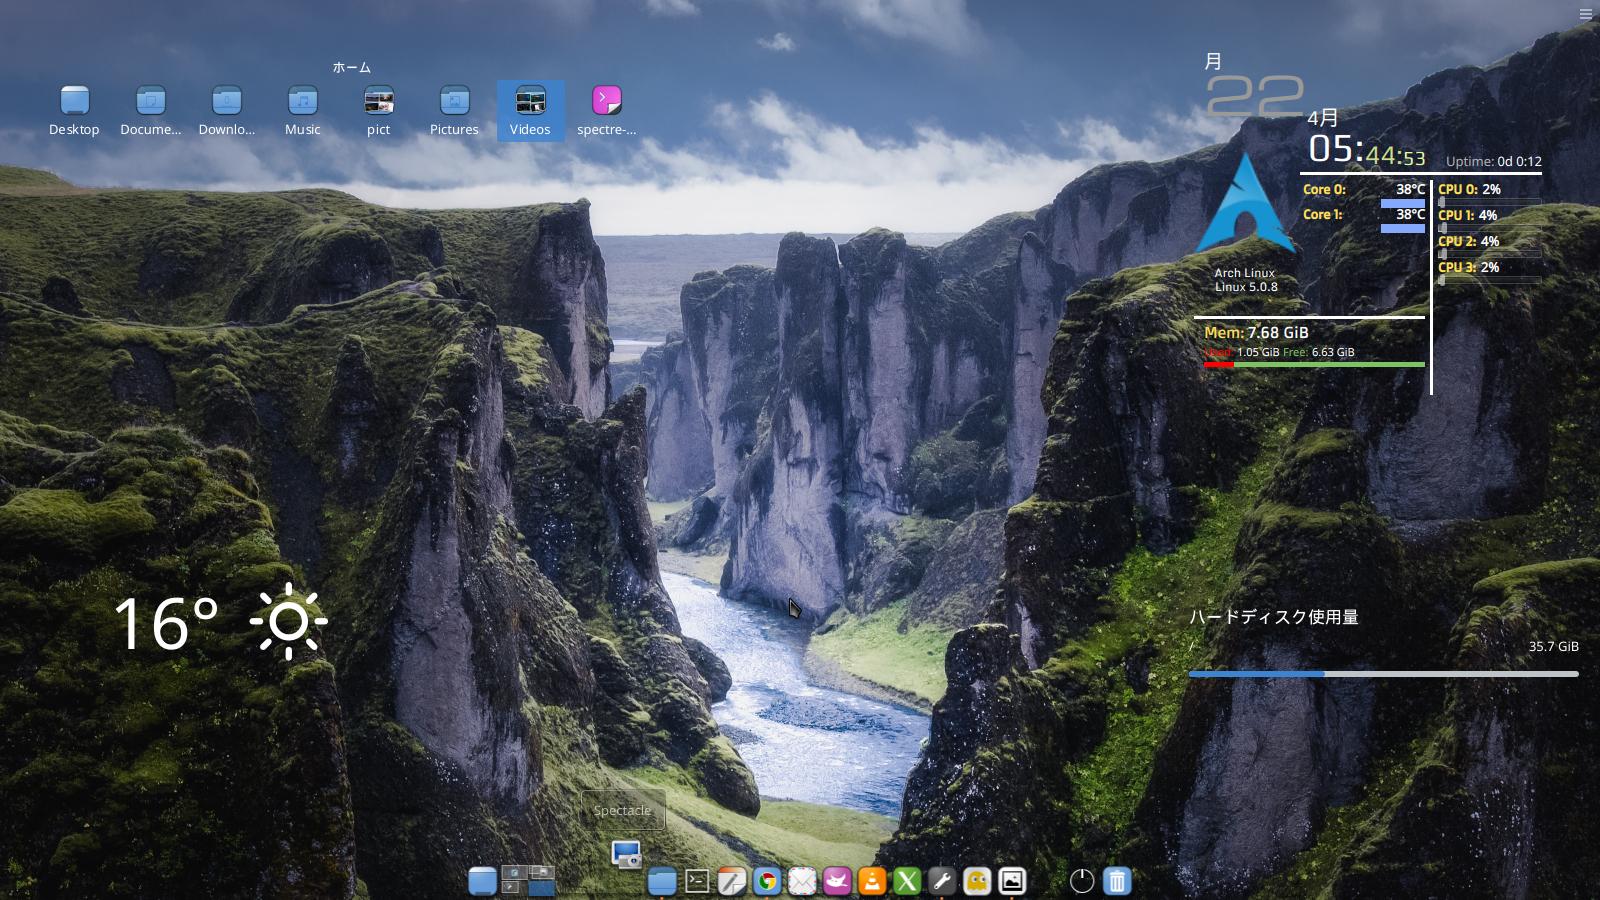 Bluestar Linux 5 0 7 最新kde Plasma 5デスクトップ 環境を有する高機能archベースを検証する 根性が試されるdistributionです 笑